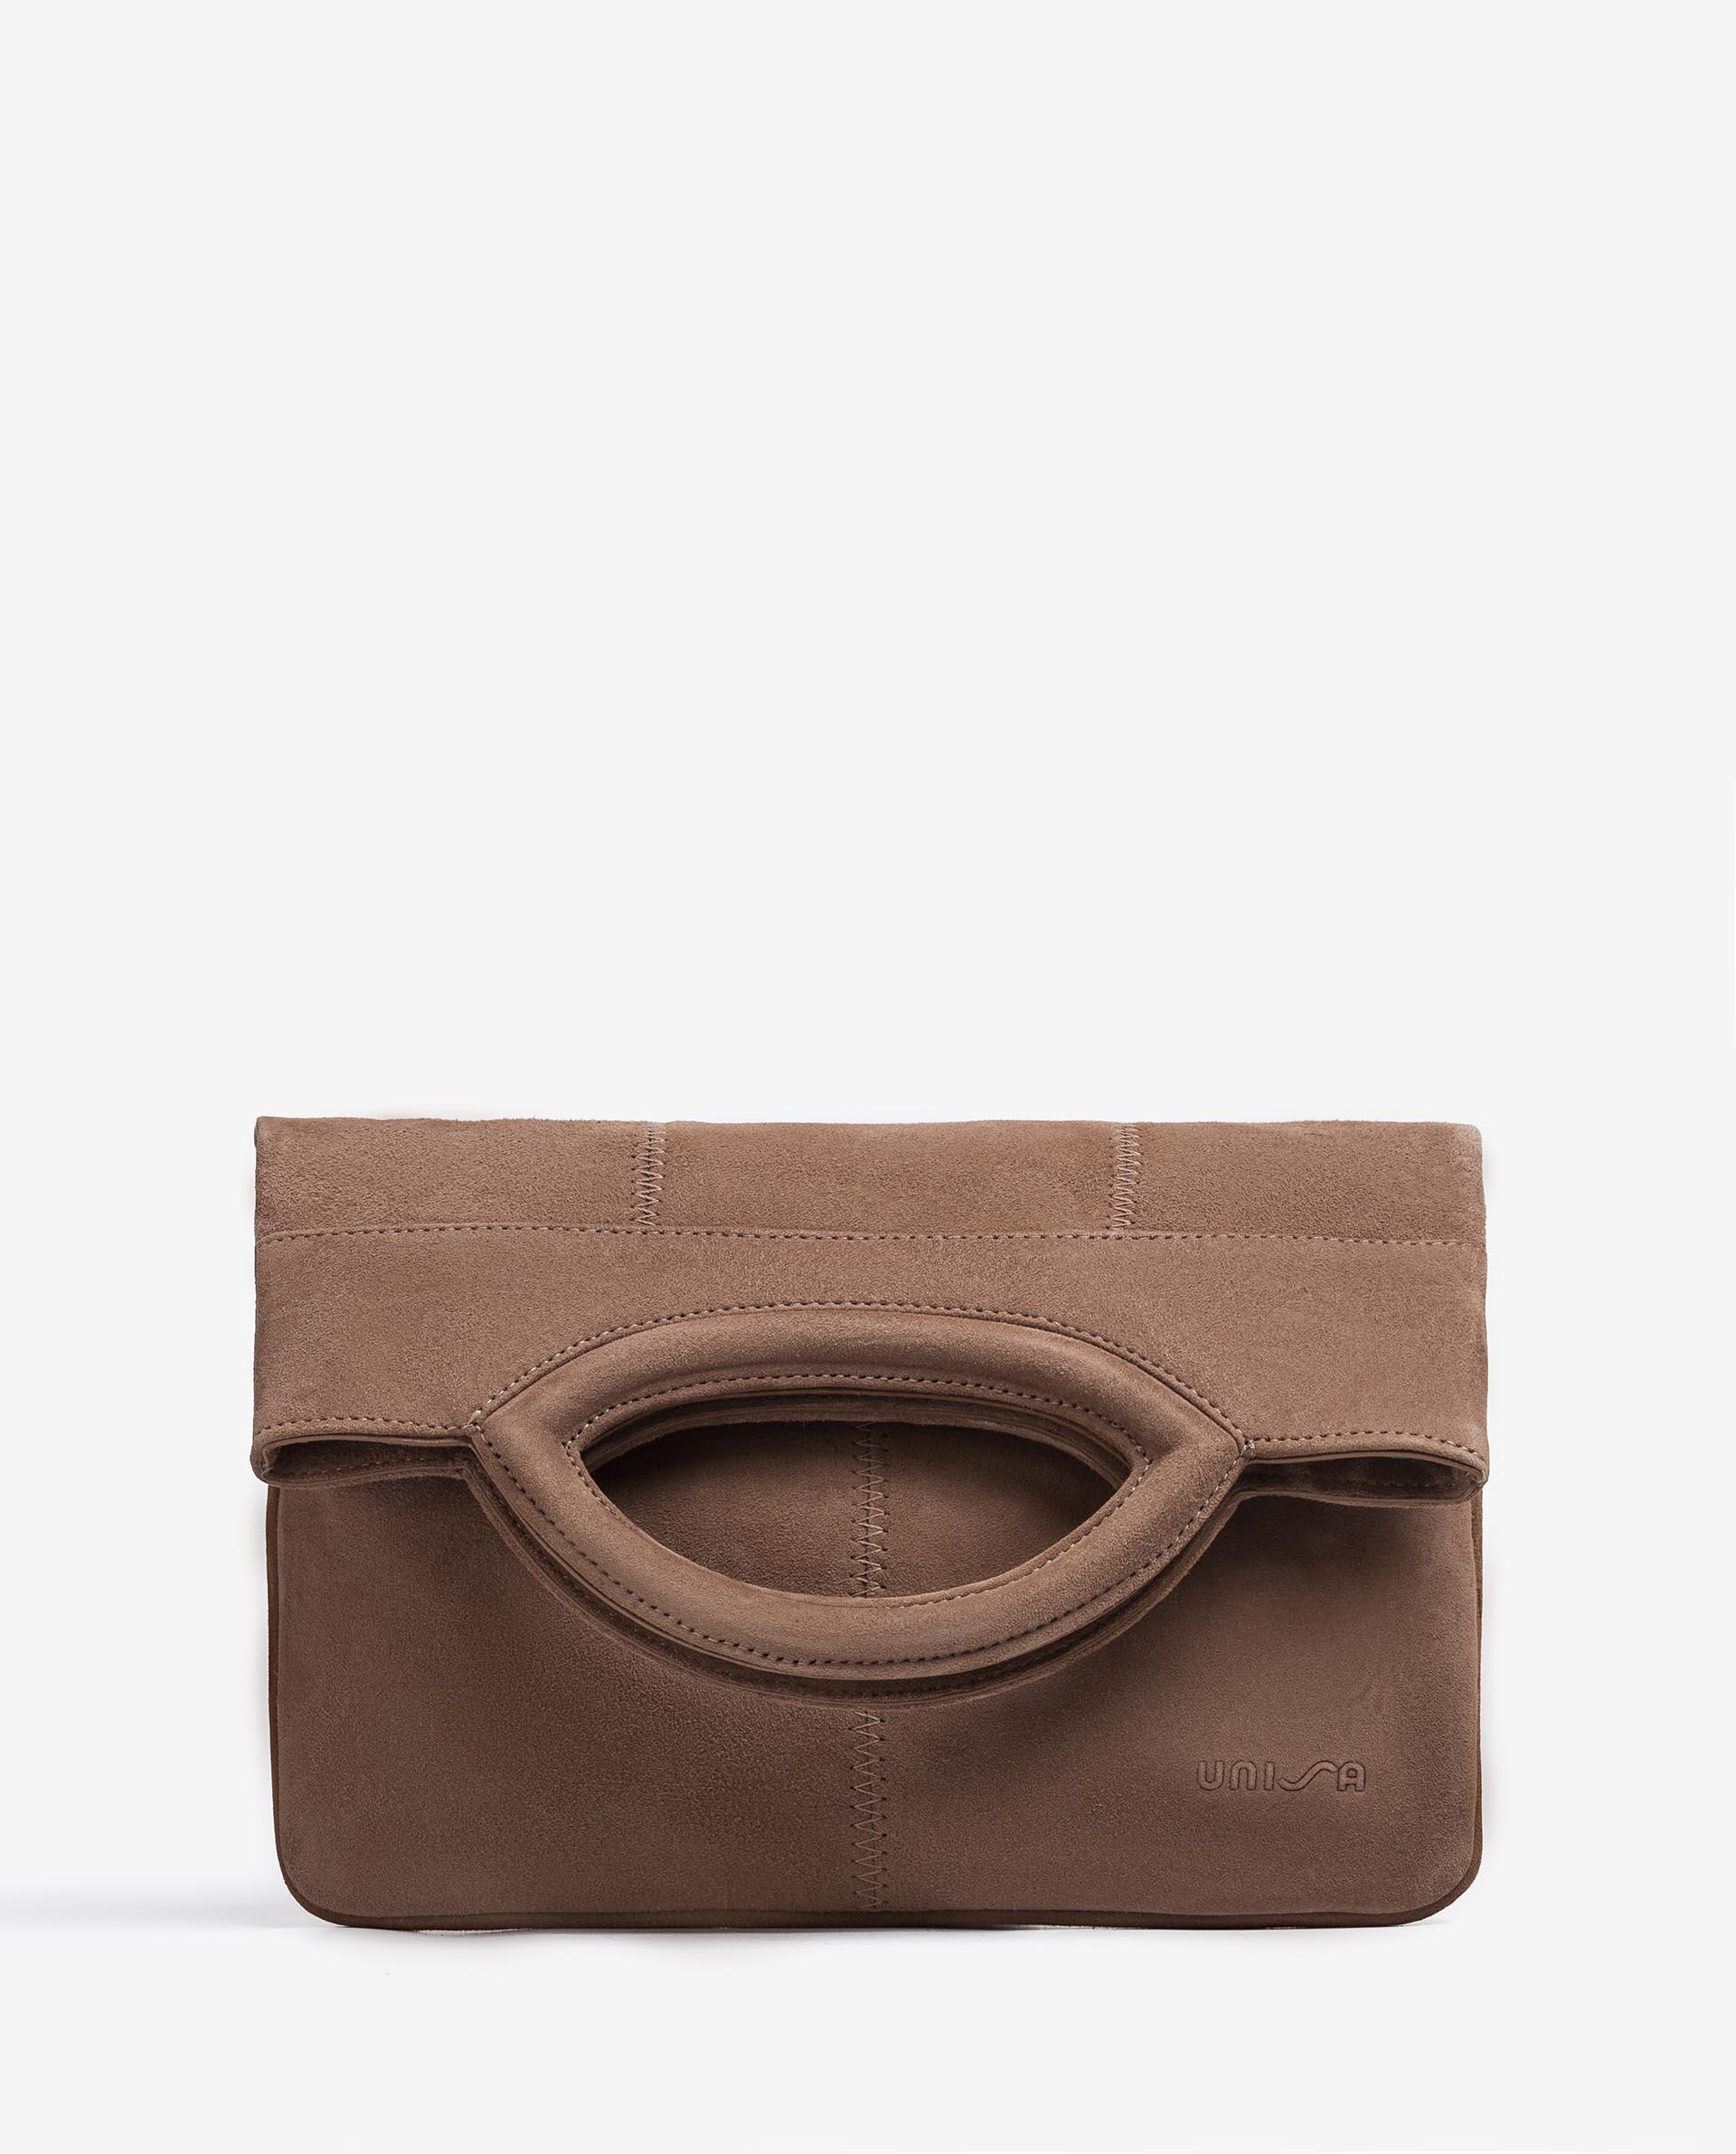 UNISA Kid sued bag with folded flap ZGALATE_KS 2